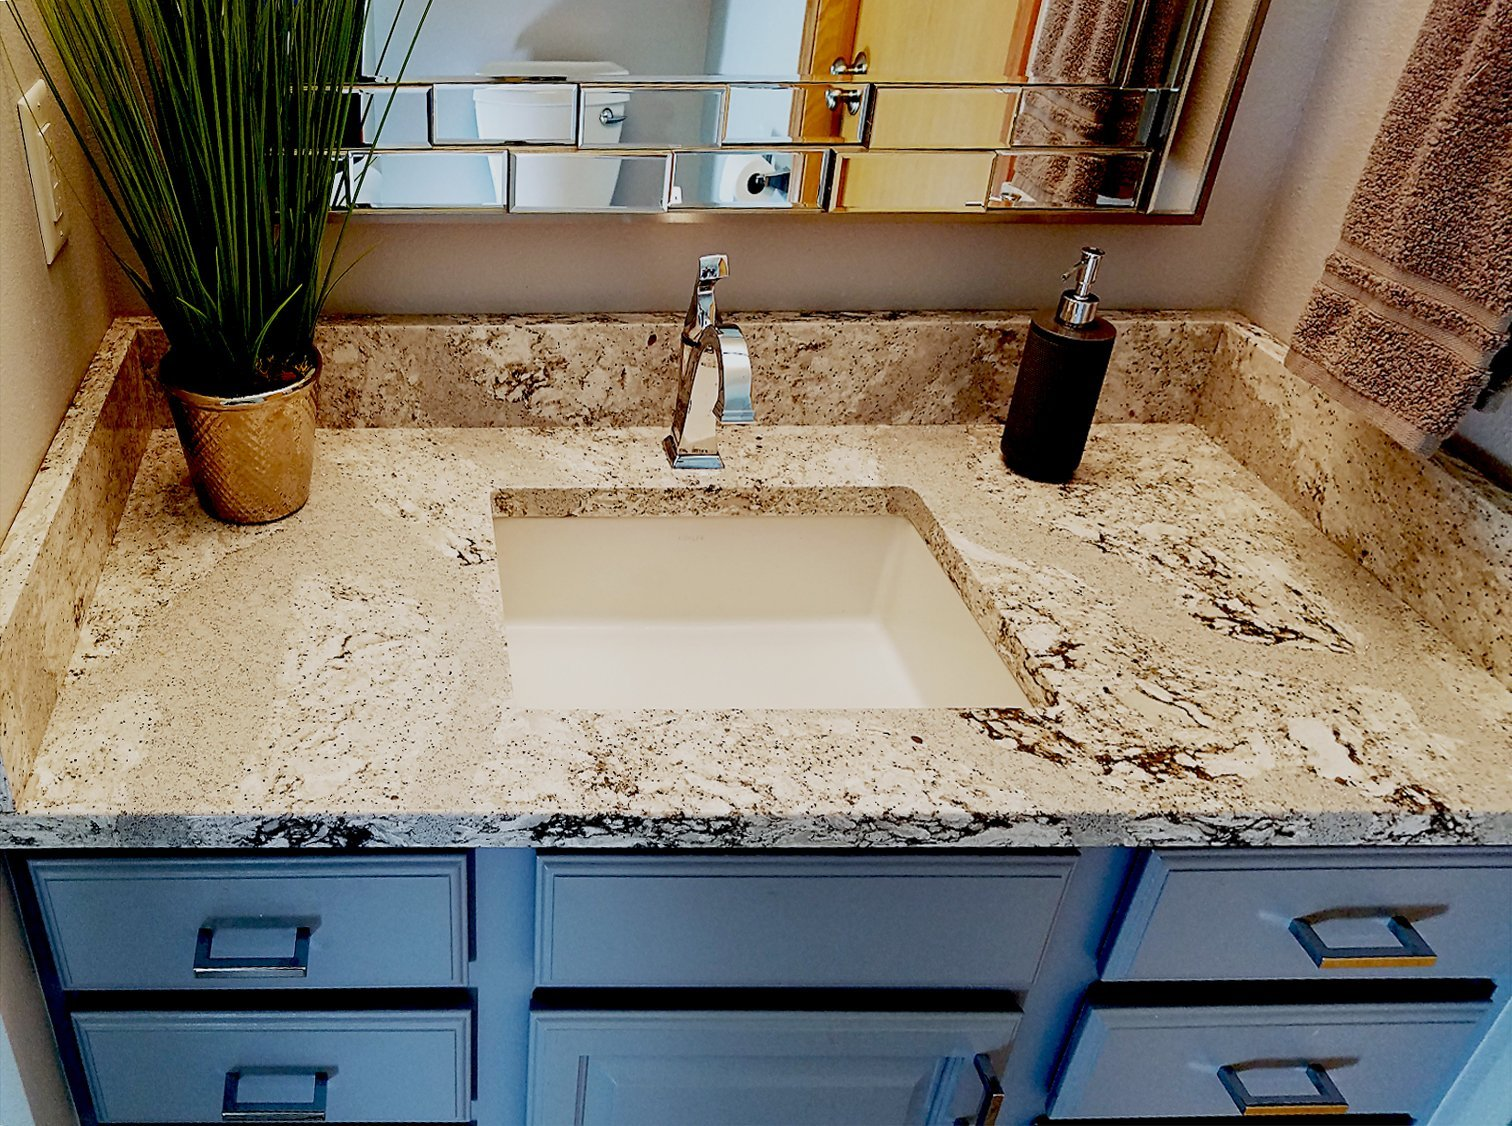 summerhill cambria countertop, square kohler verticyl sink,